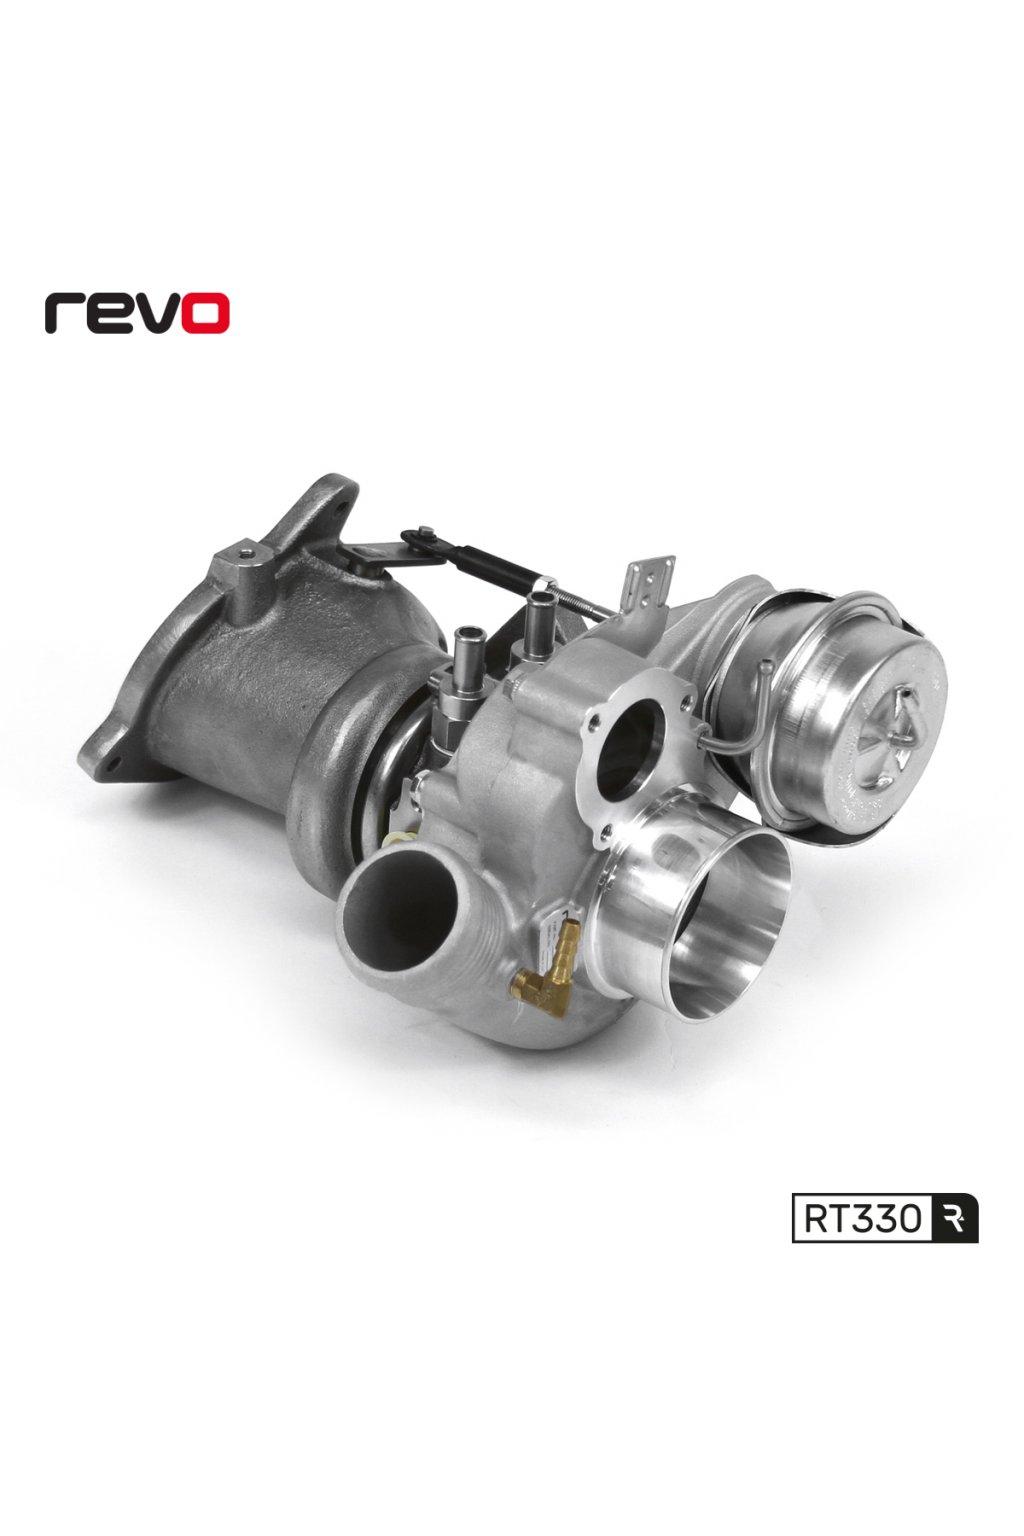 Revo RT330 Fiesta ST180 Turbo